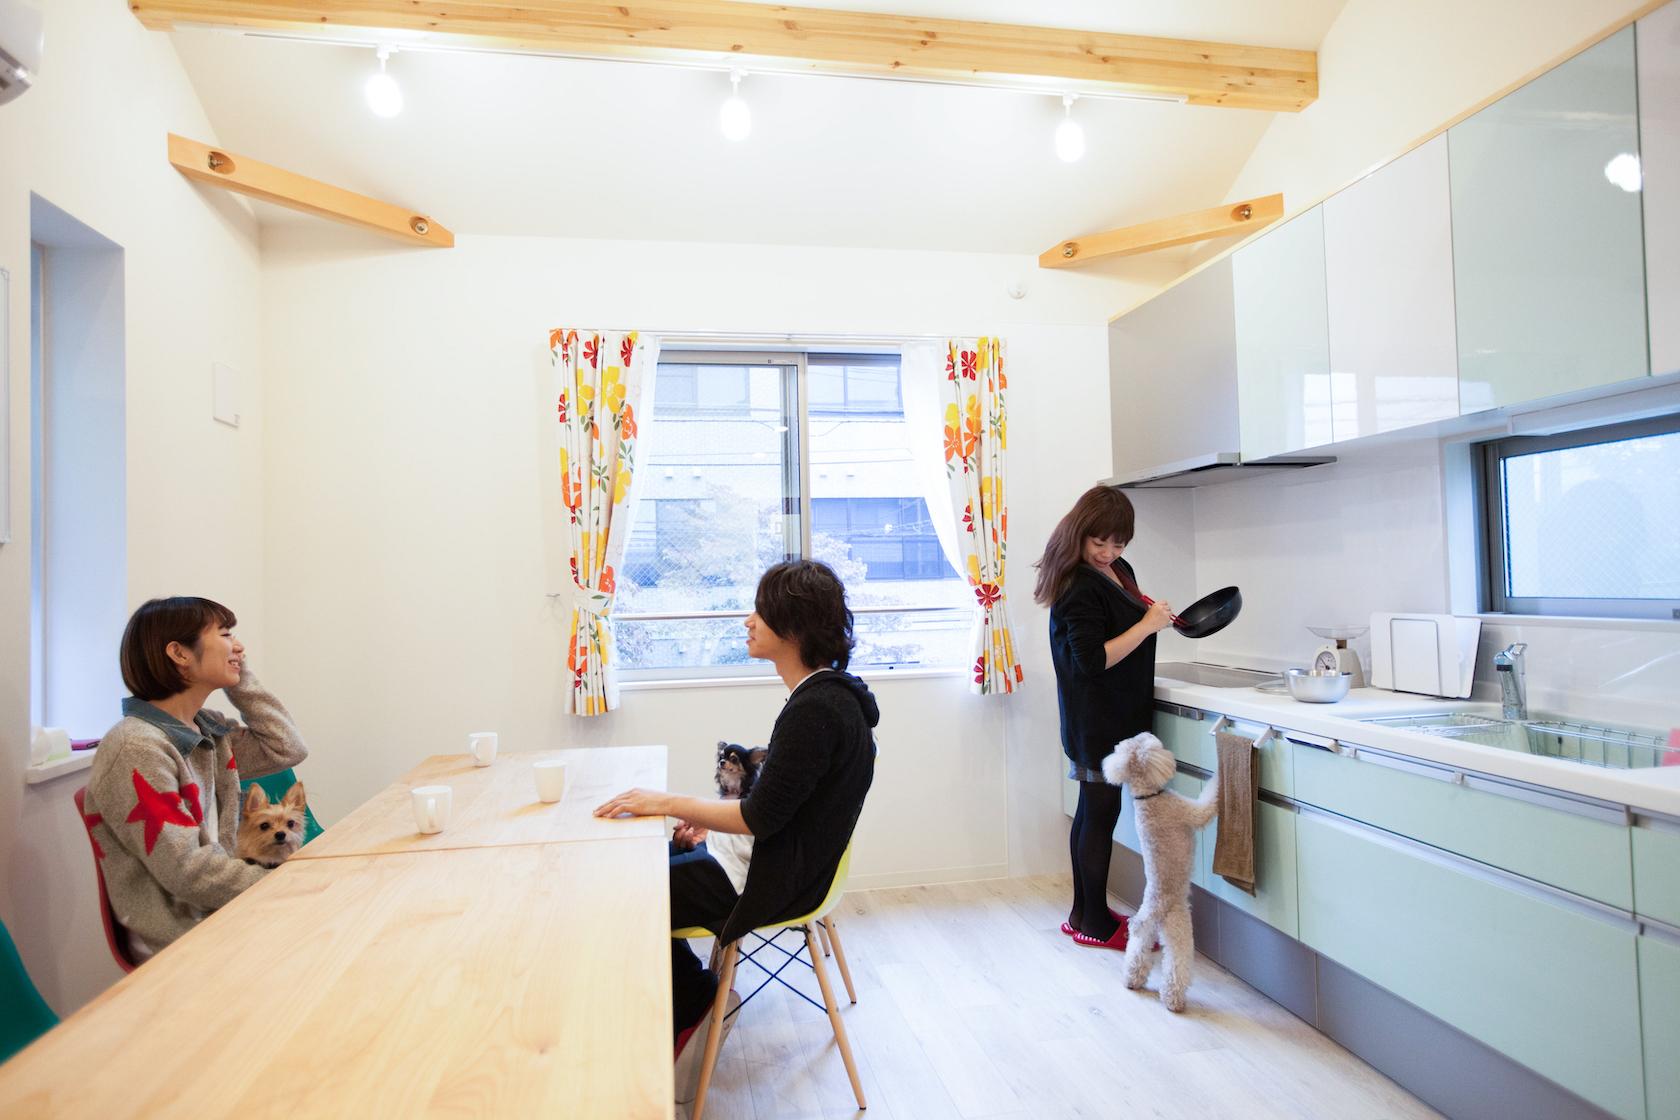 HOUSE-ZOO国立|犬猫可シェアハウス【東京都国立市 矢川駅】